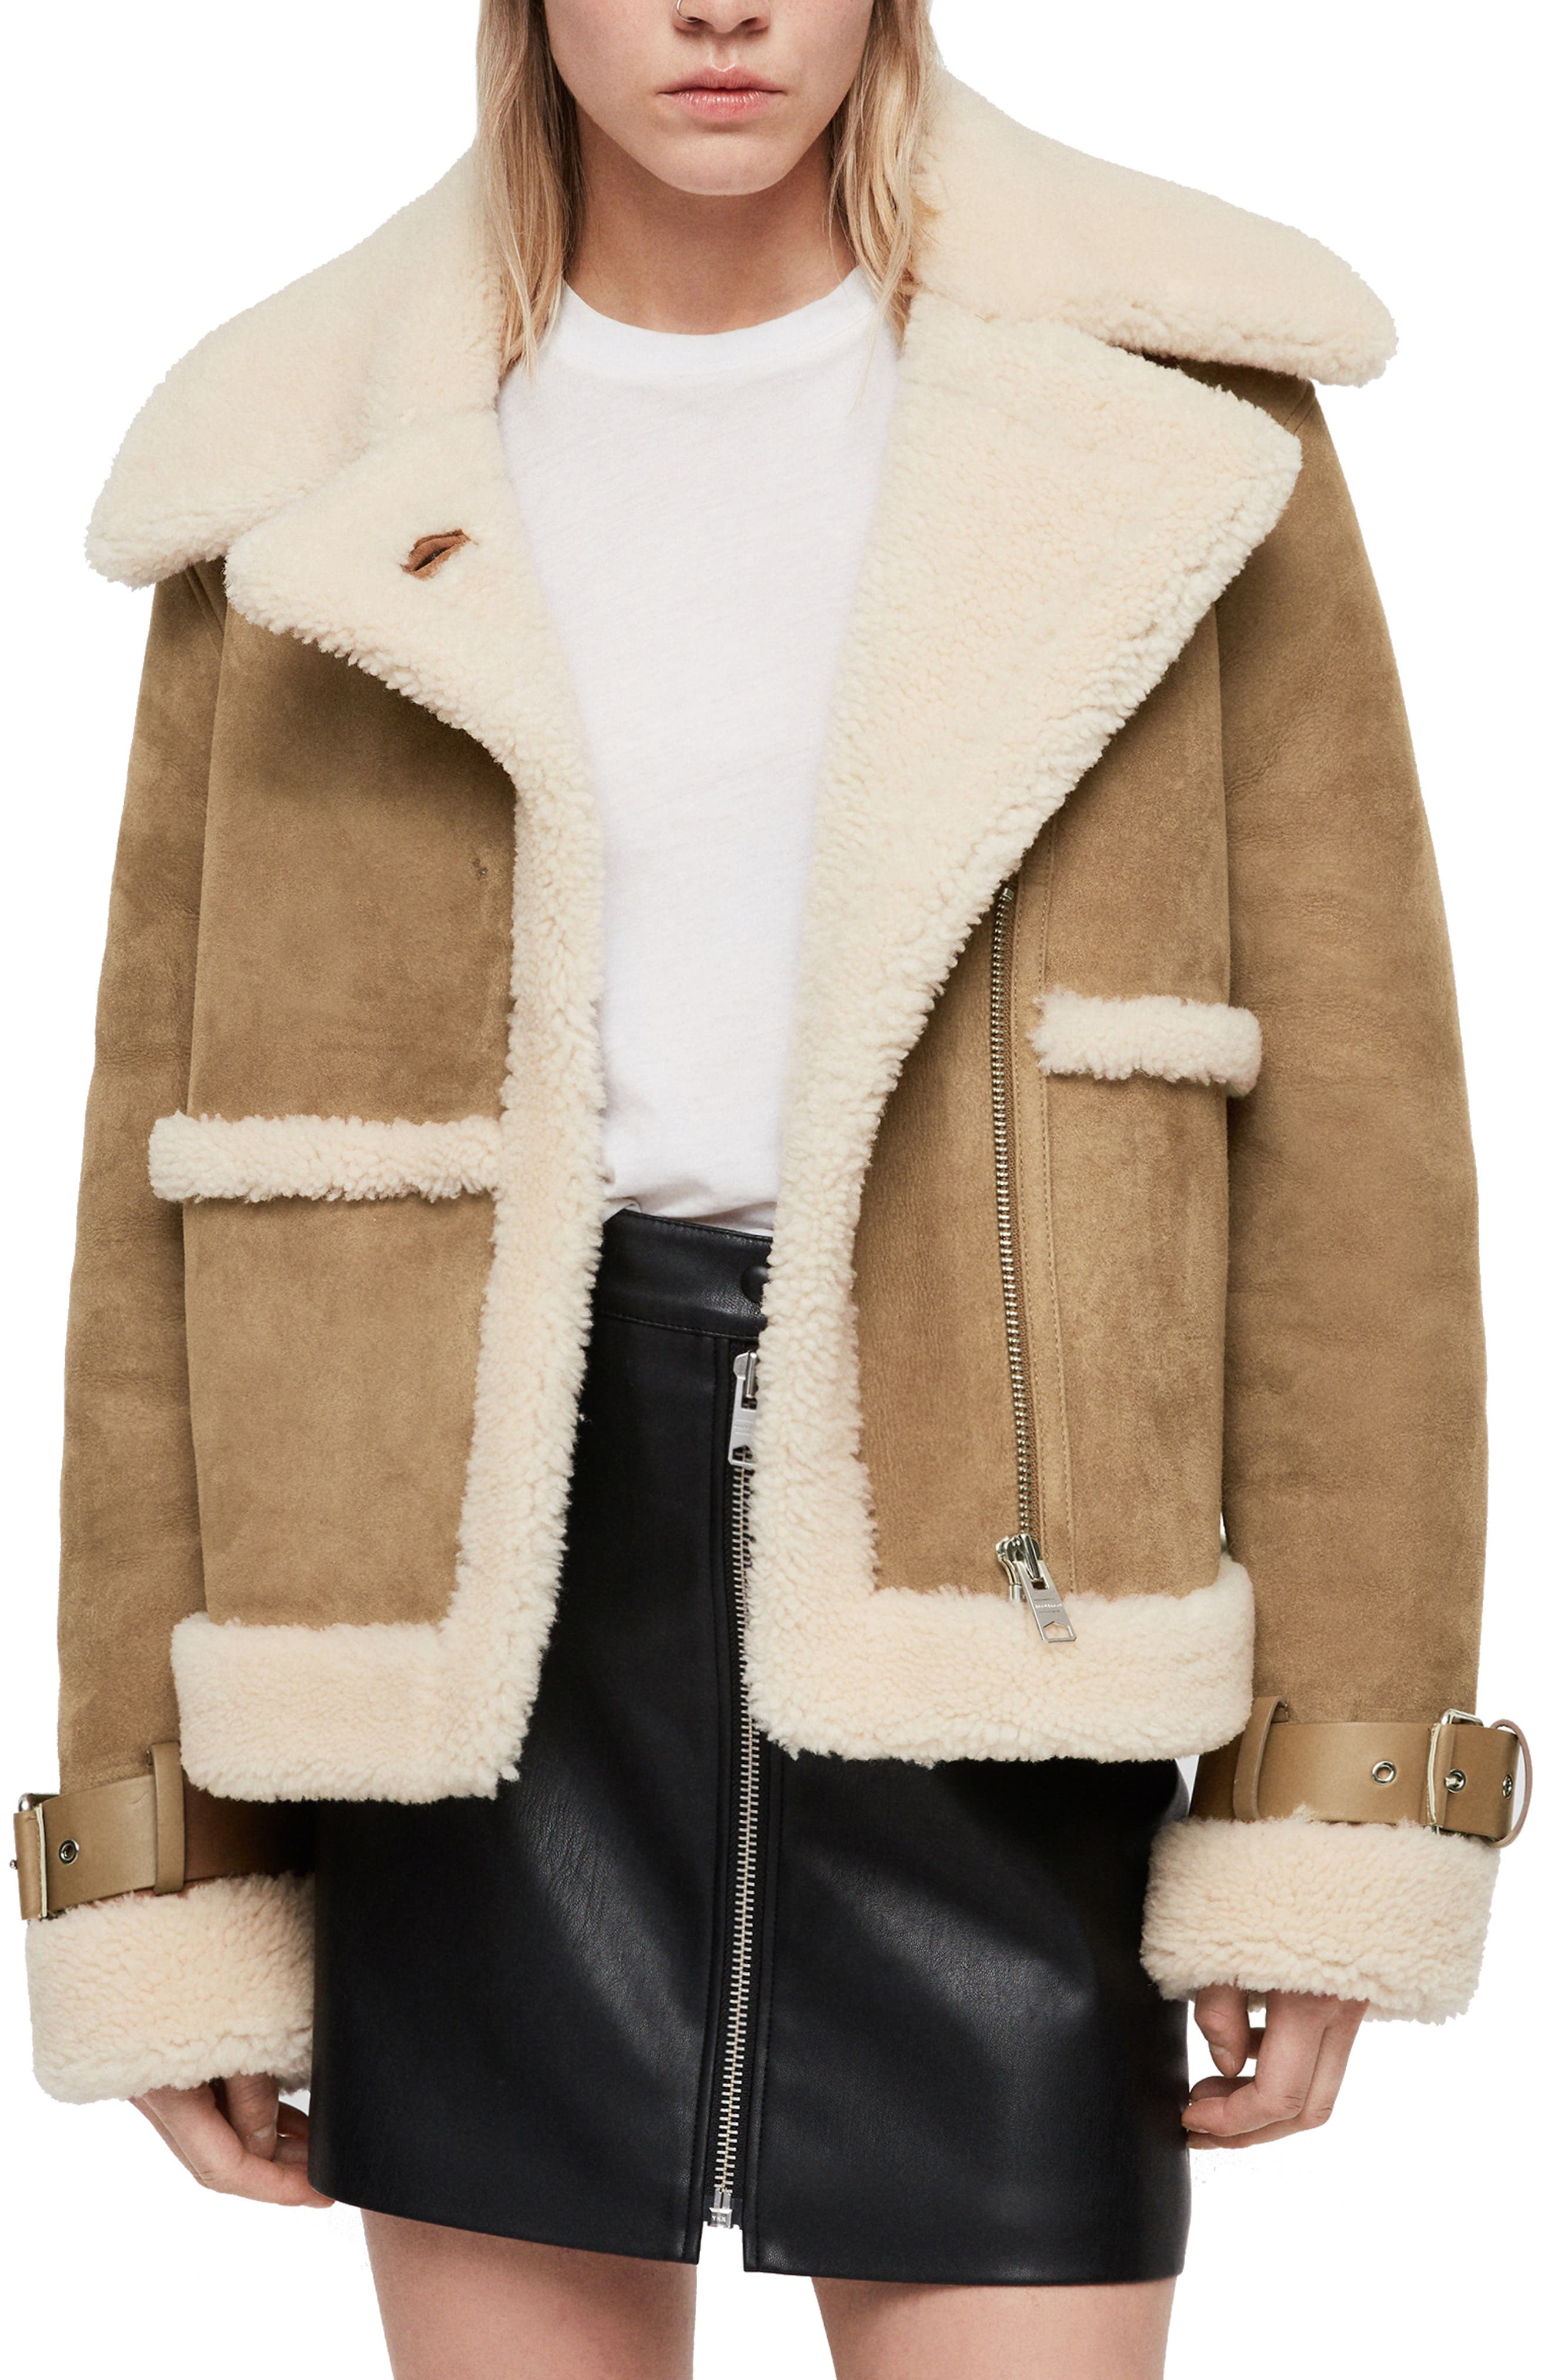 Farley Genuine Shearling Jacket,                             Main thumbnail 1, color,                             SAND BROWN/ ECRU